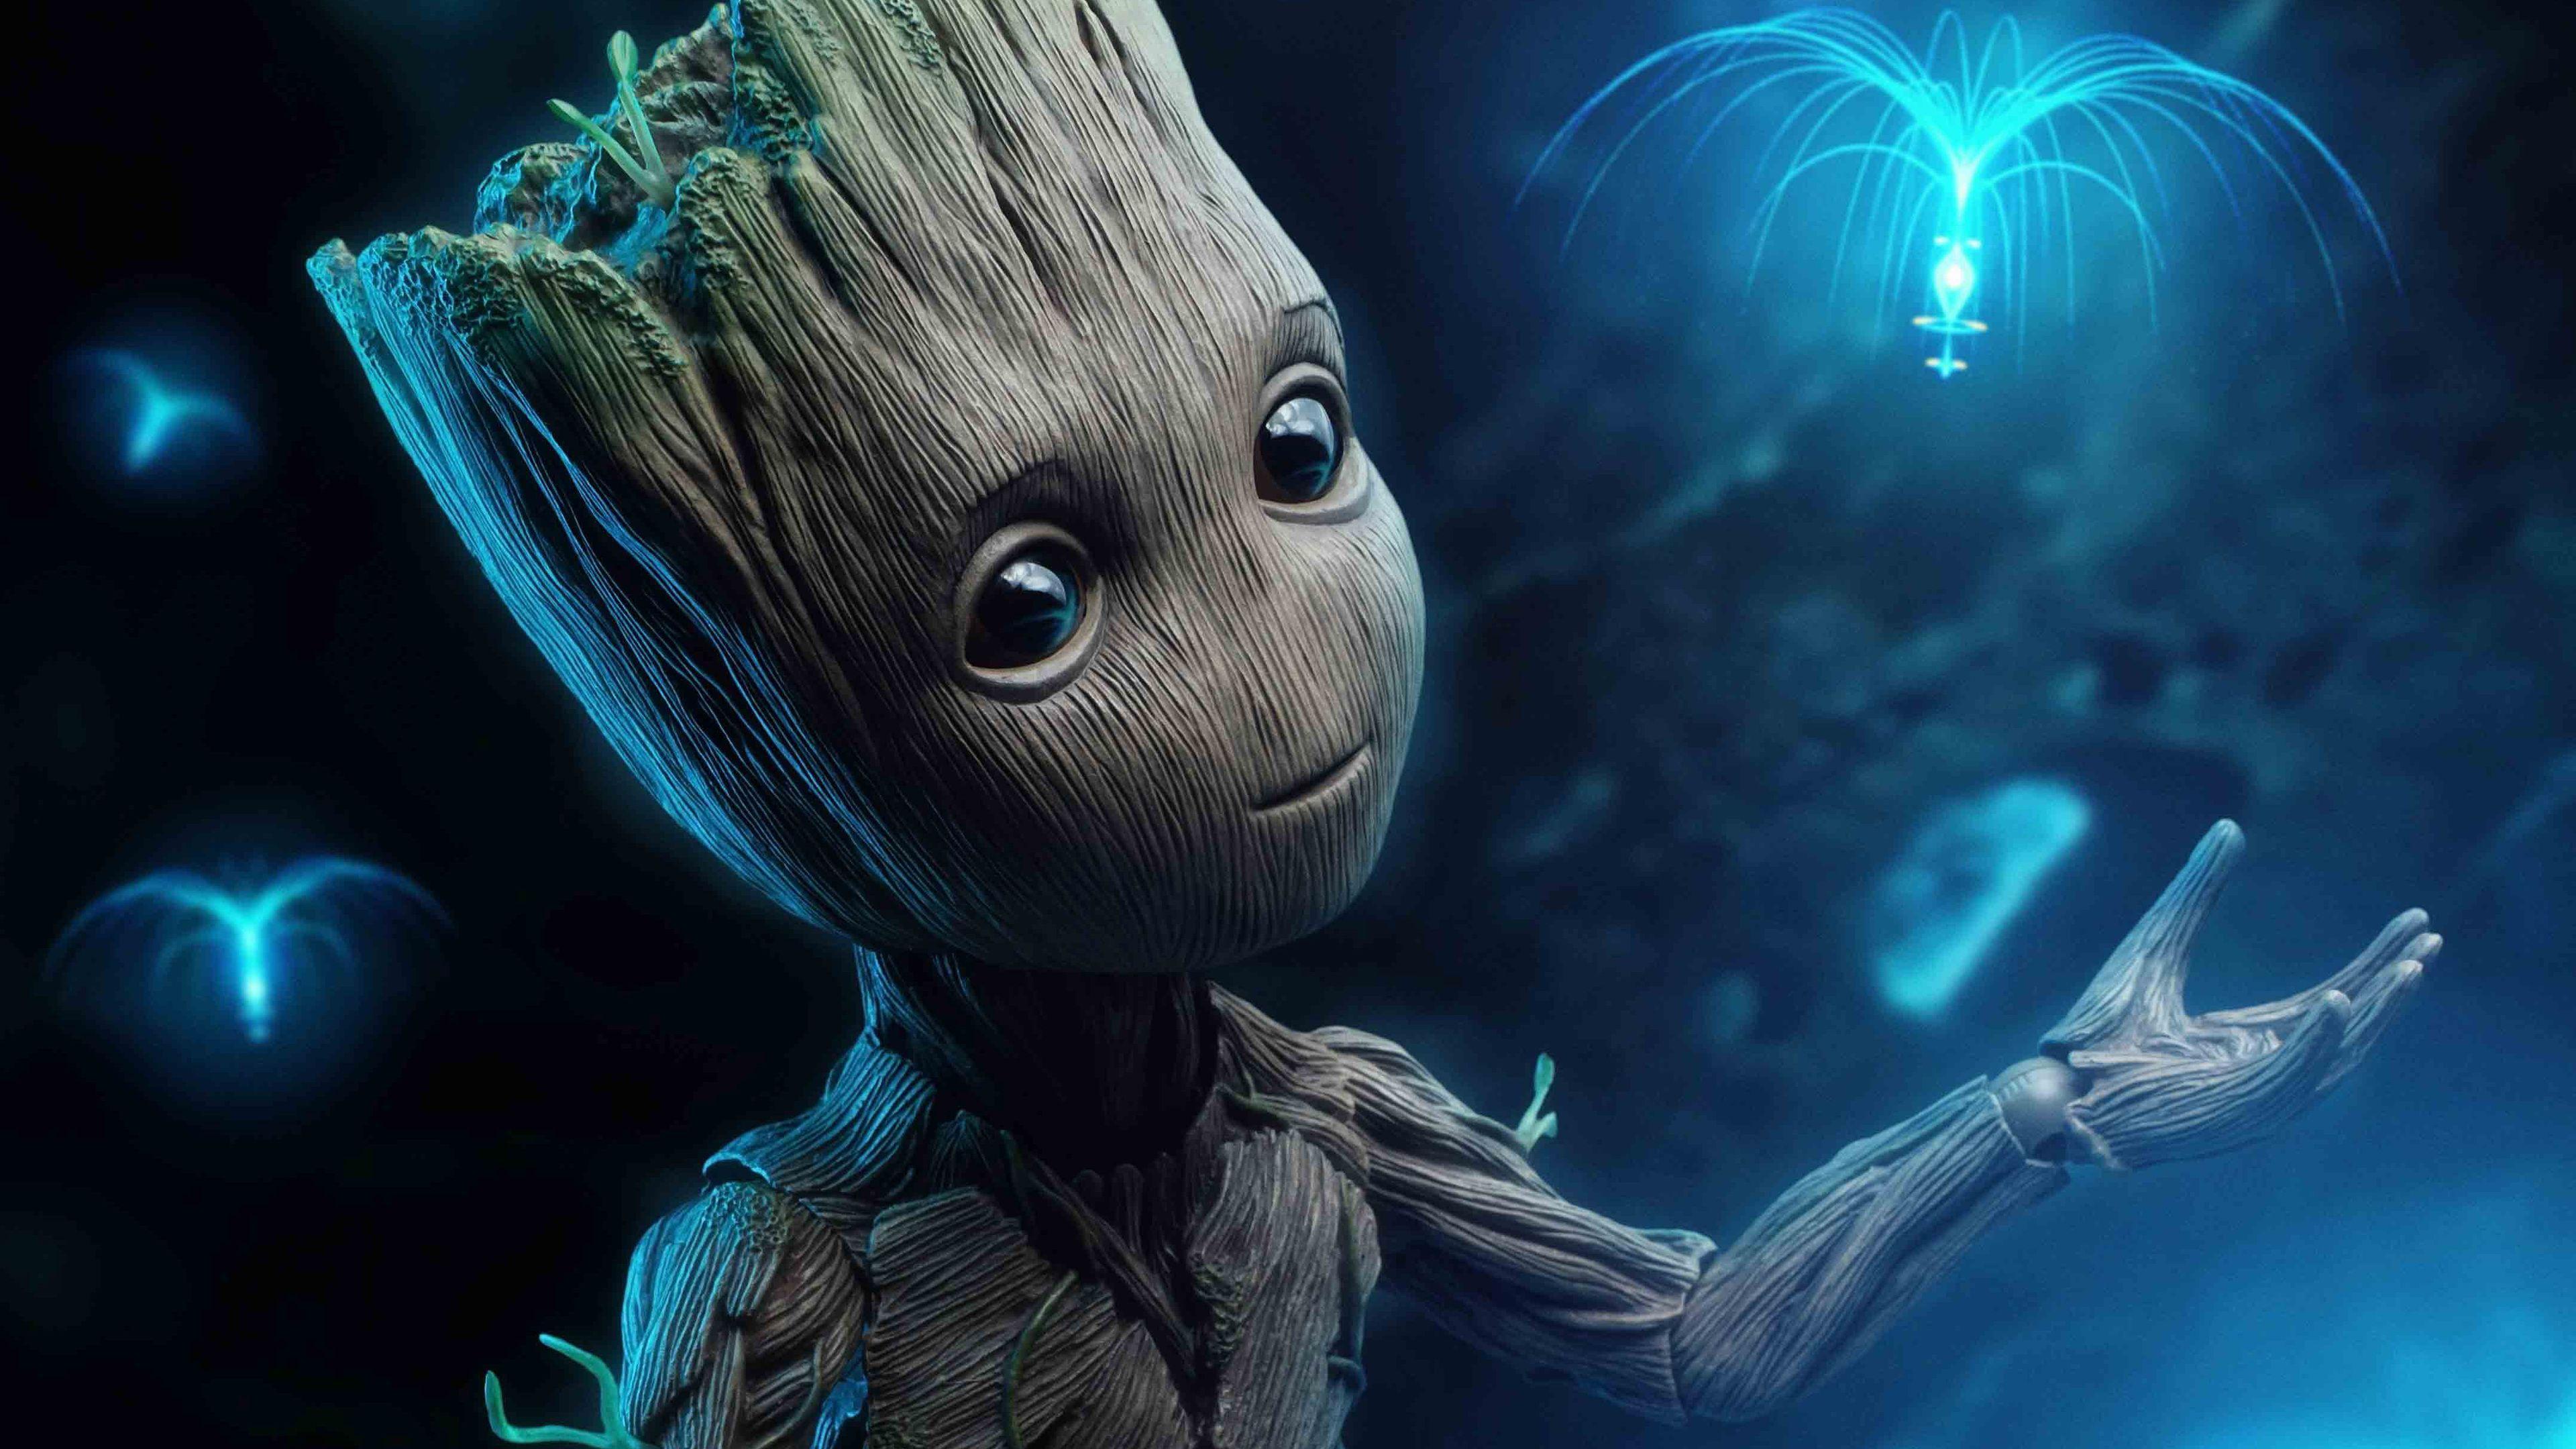 Baby Groot Wallpapers - Top Free Baby Groot Backgrounds ...